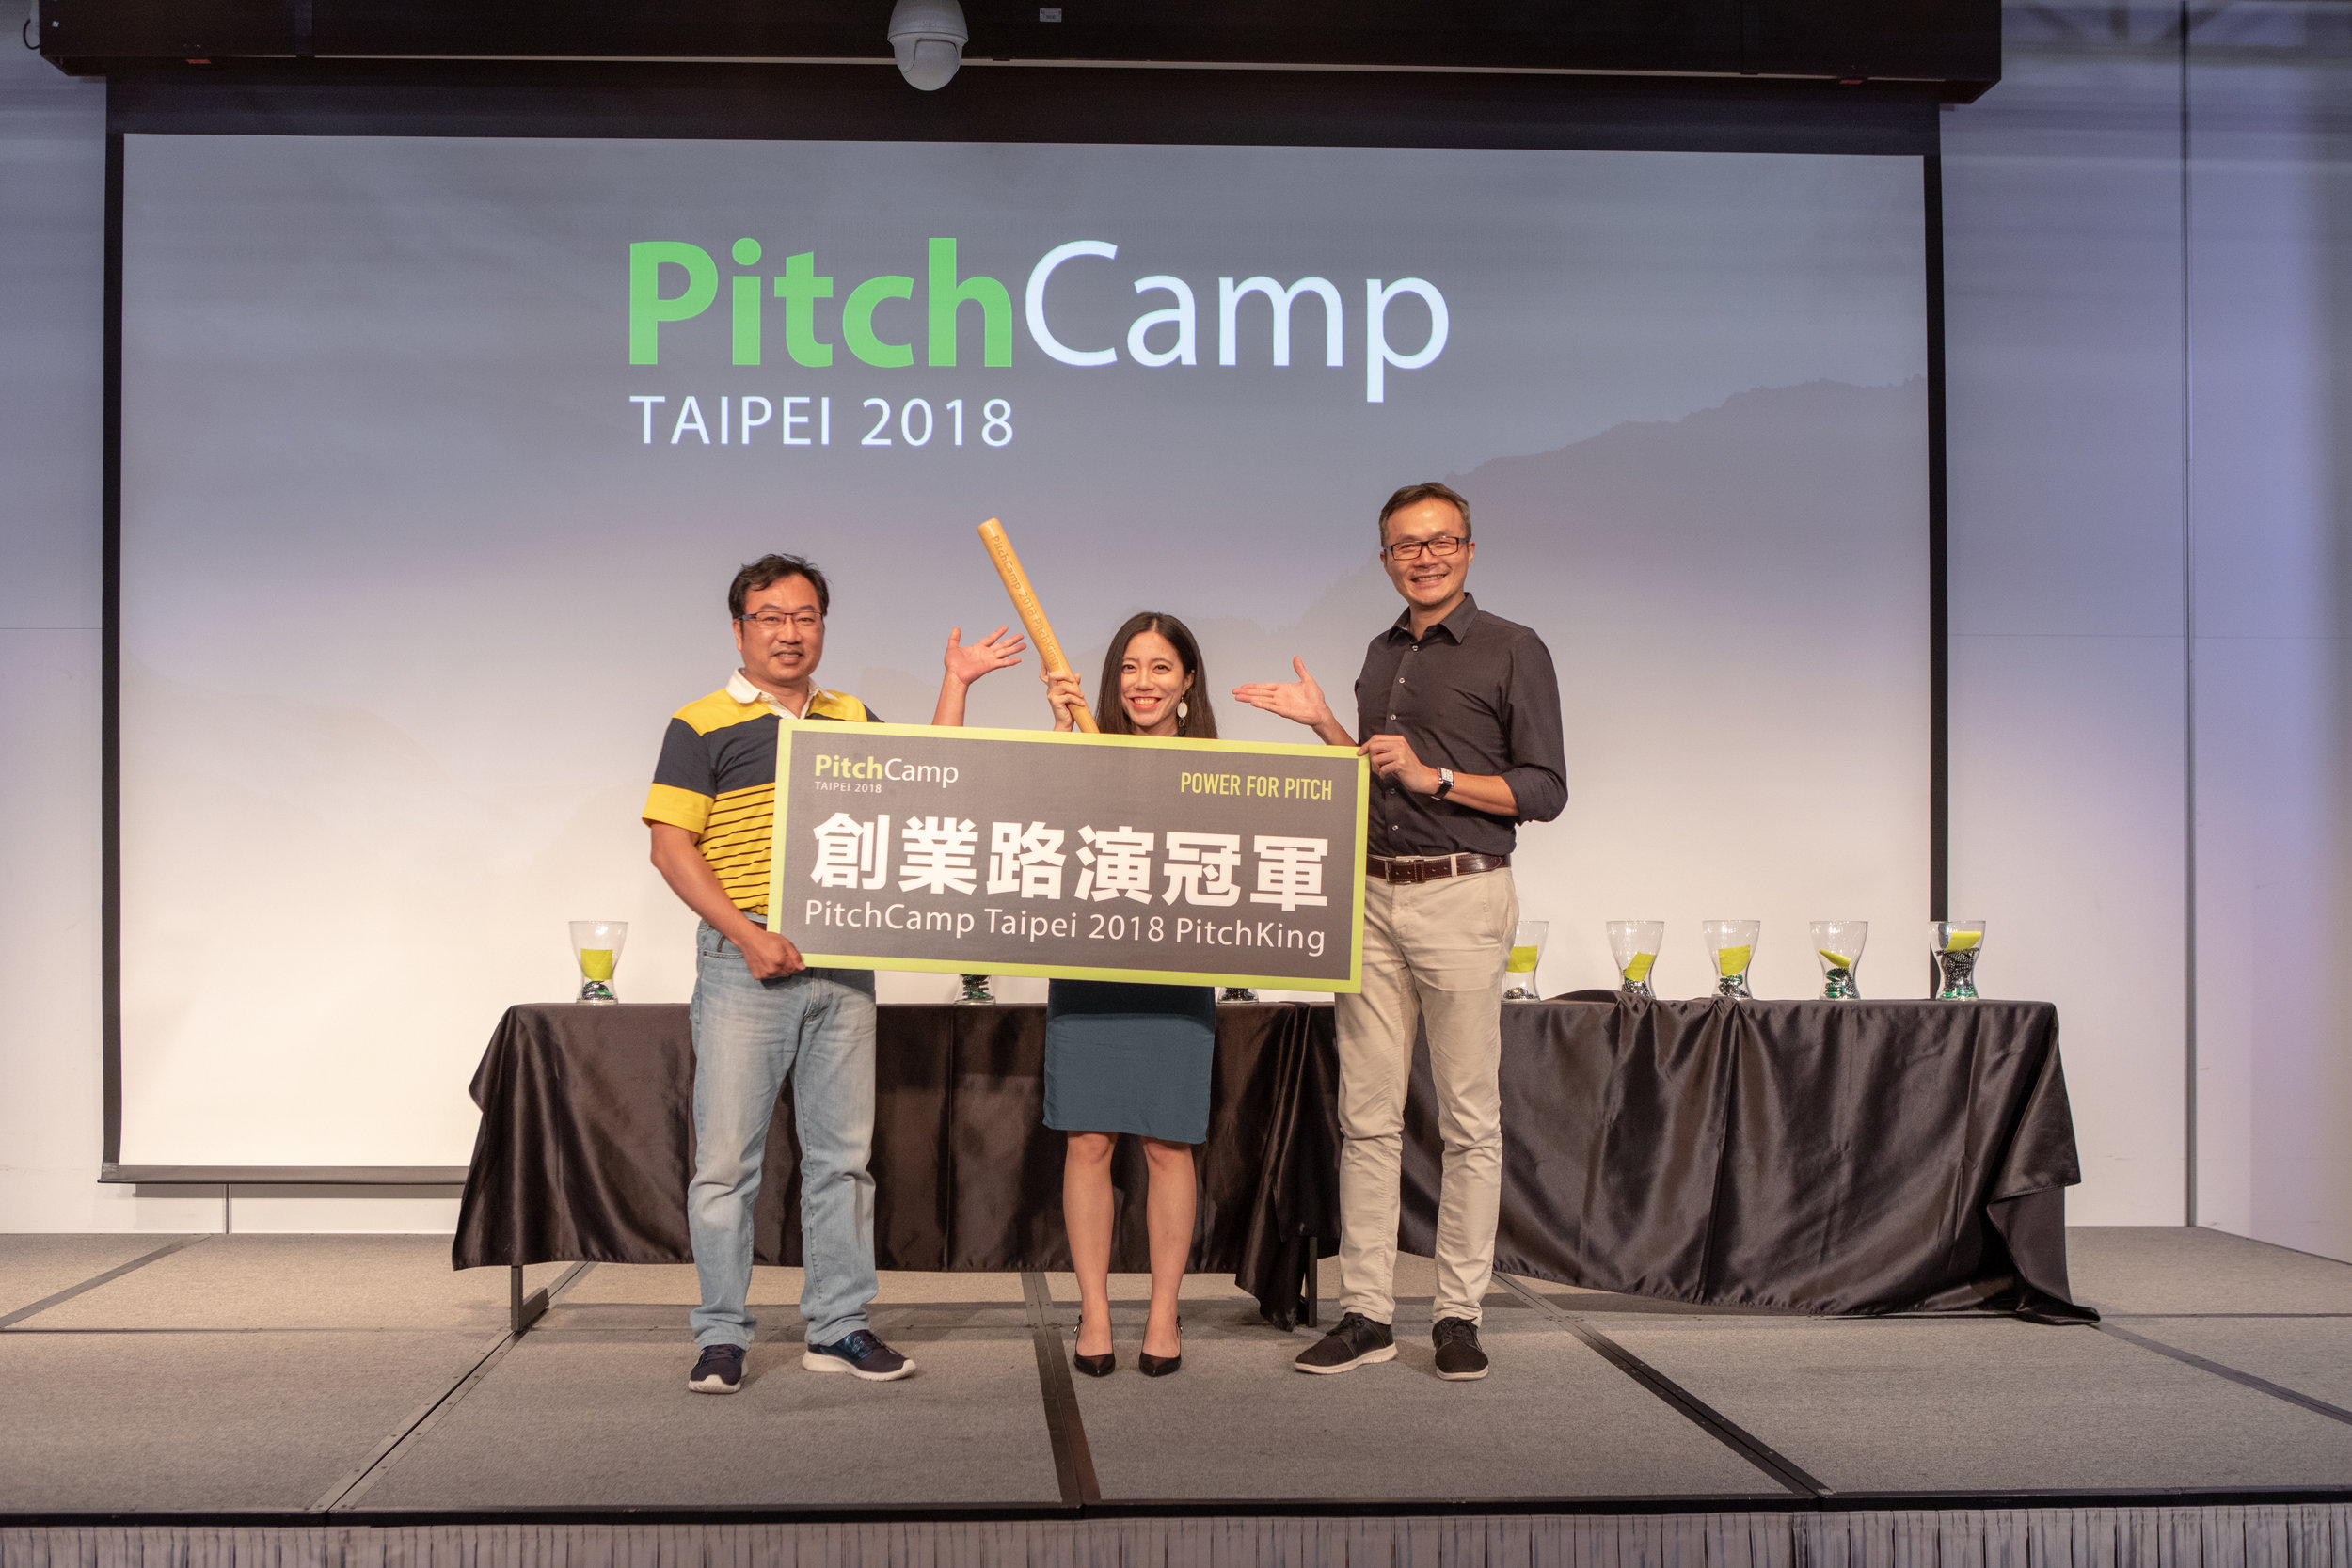 PitchCamp 2018